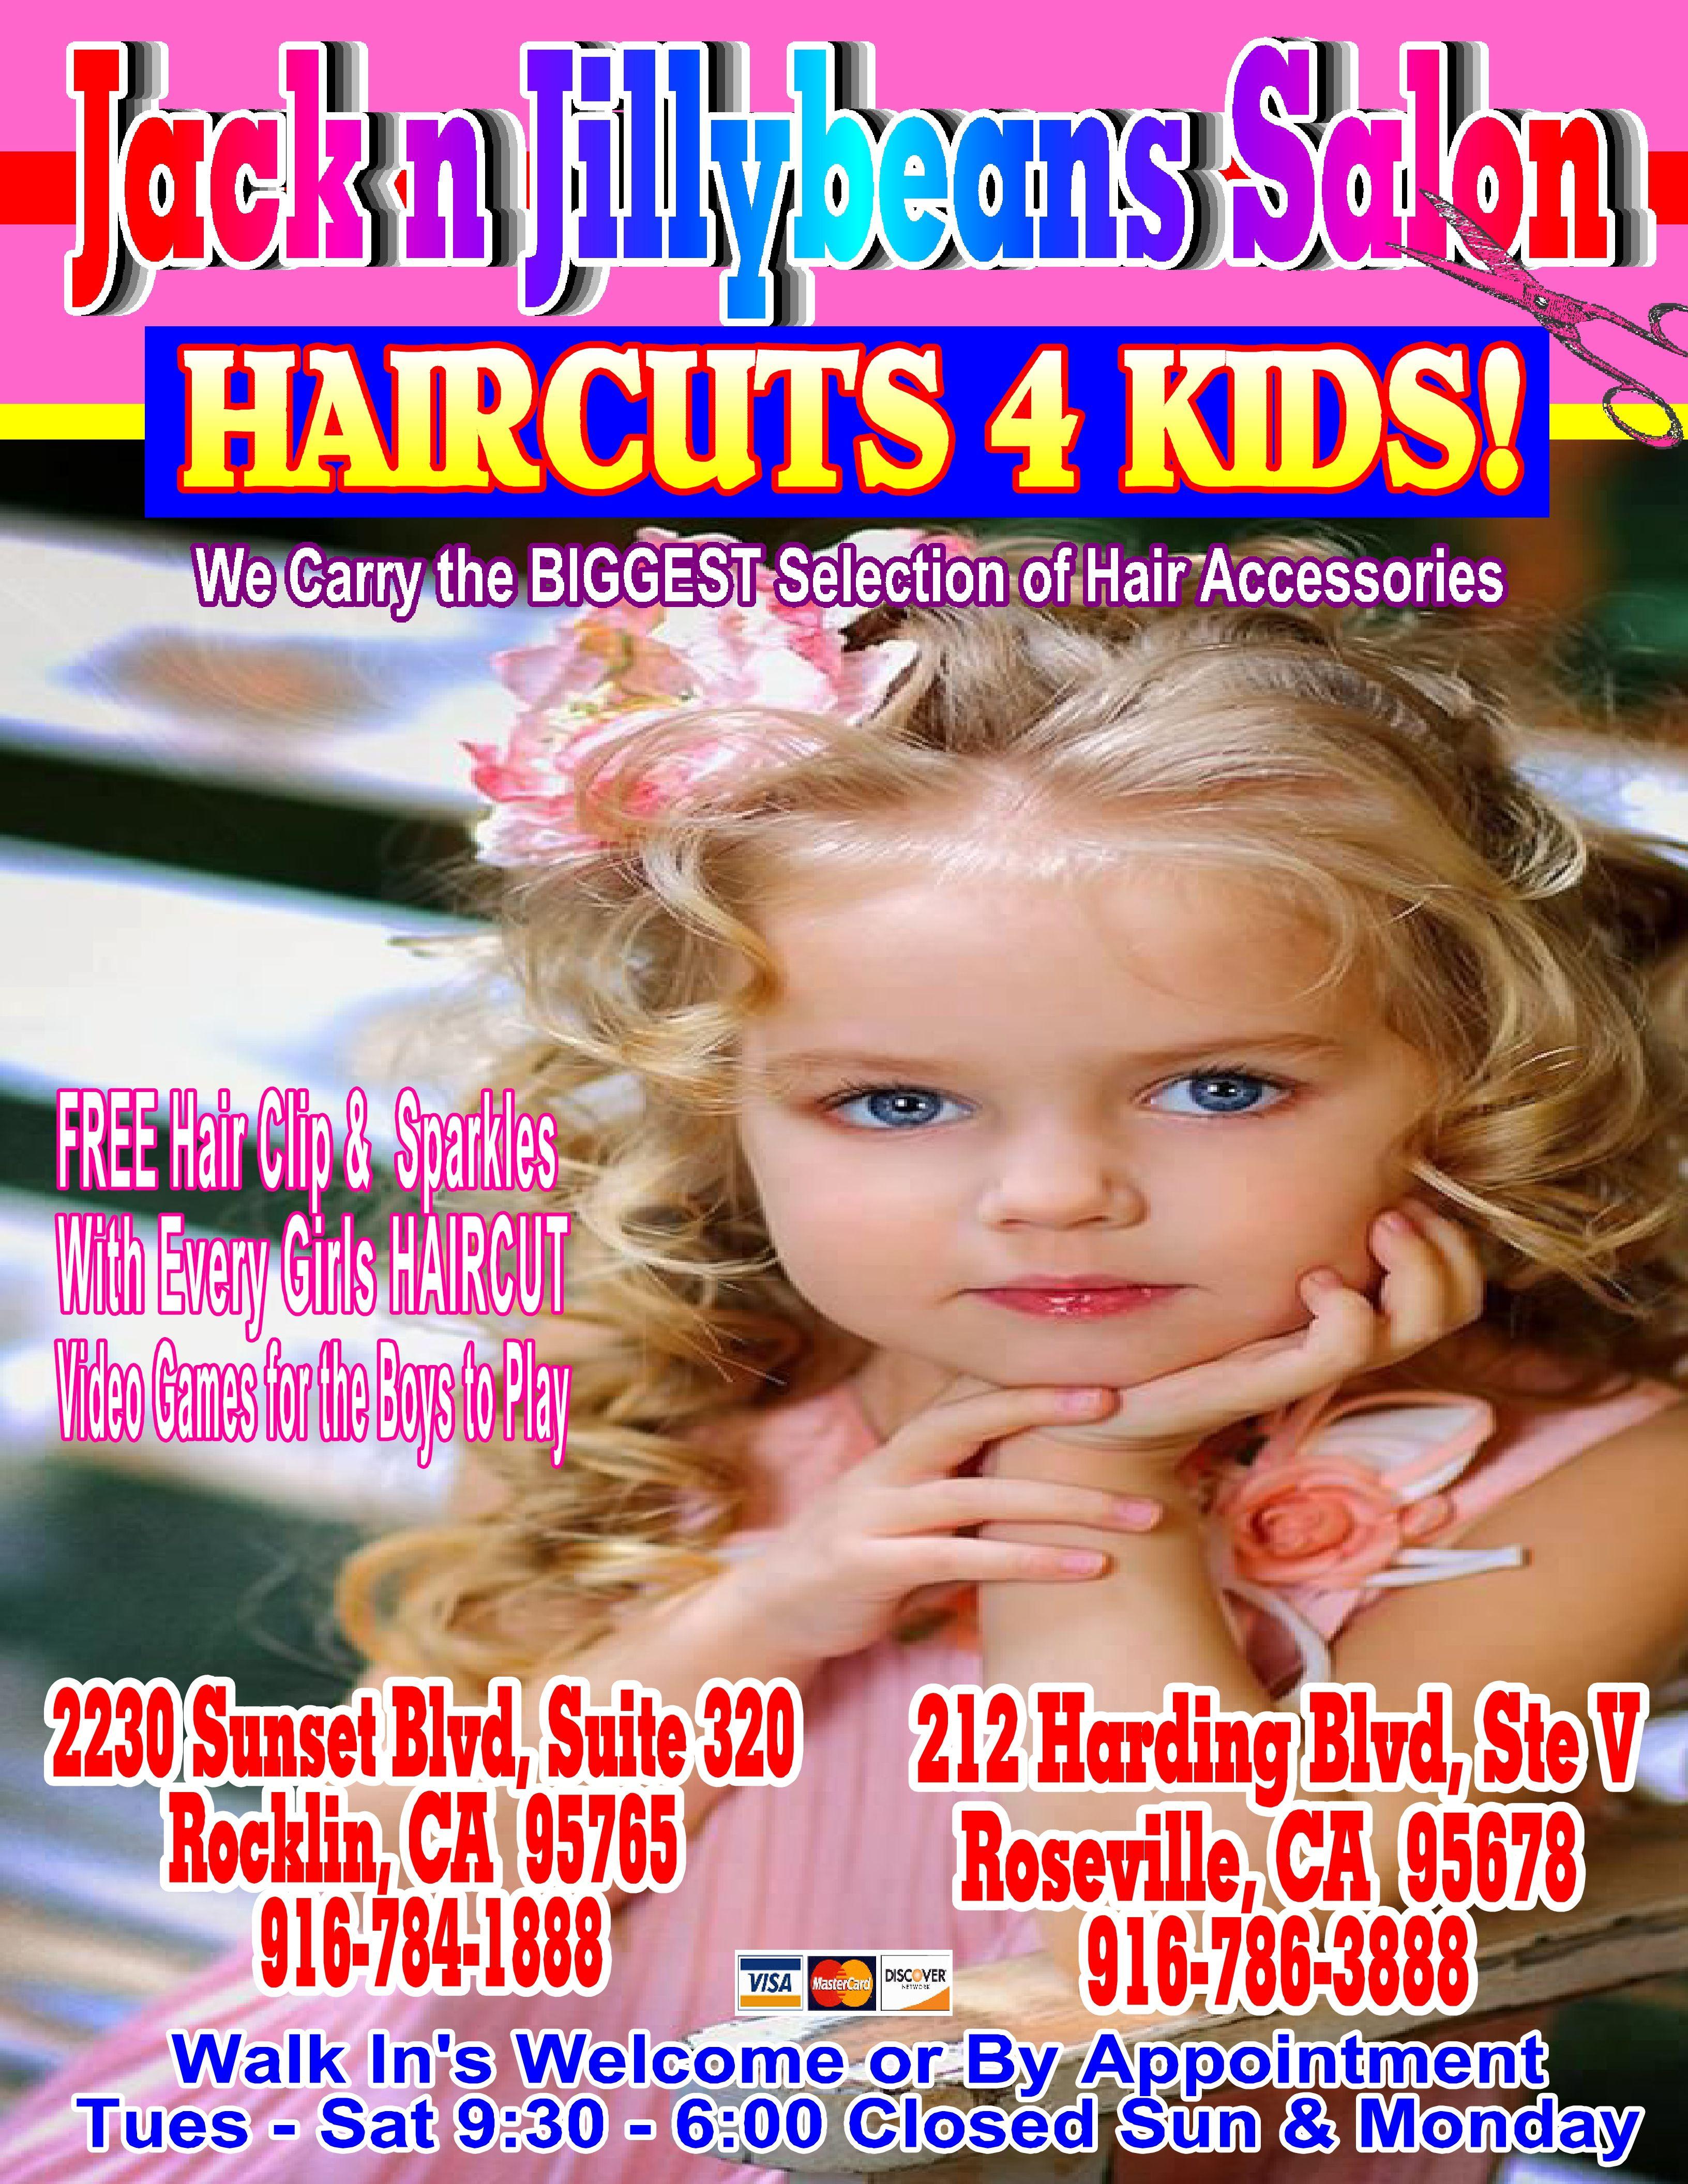 Haircut Rocklin Ca Gallery Haircuts for Men and Women